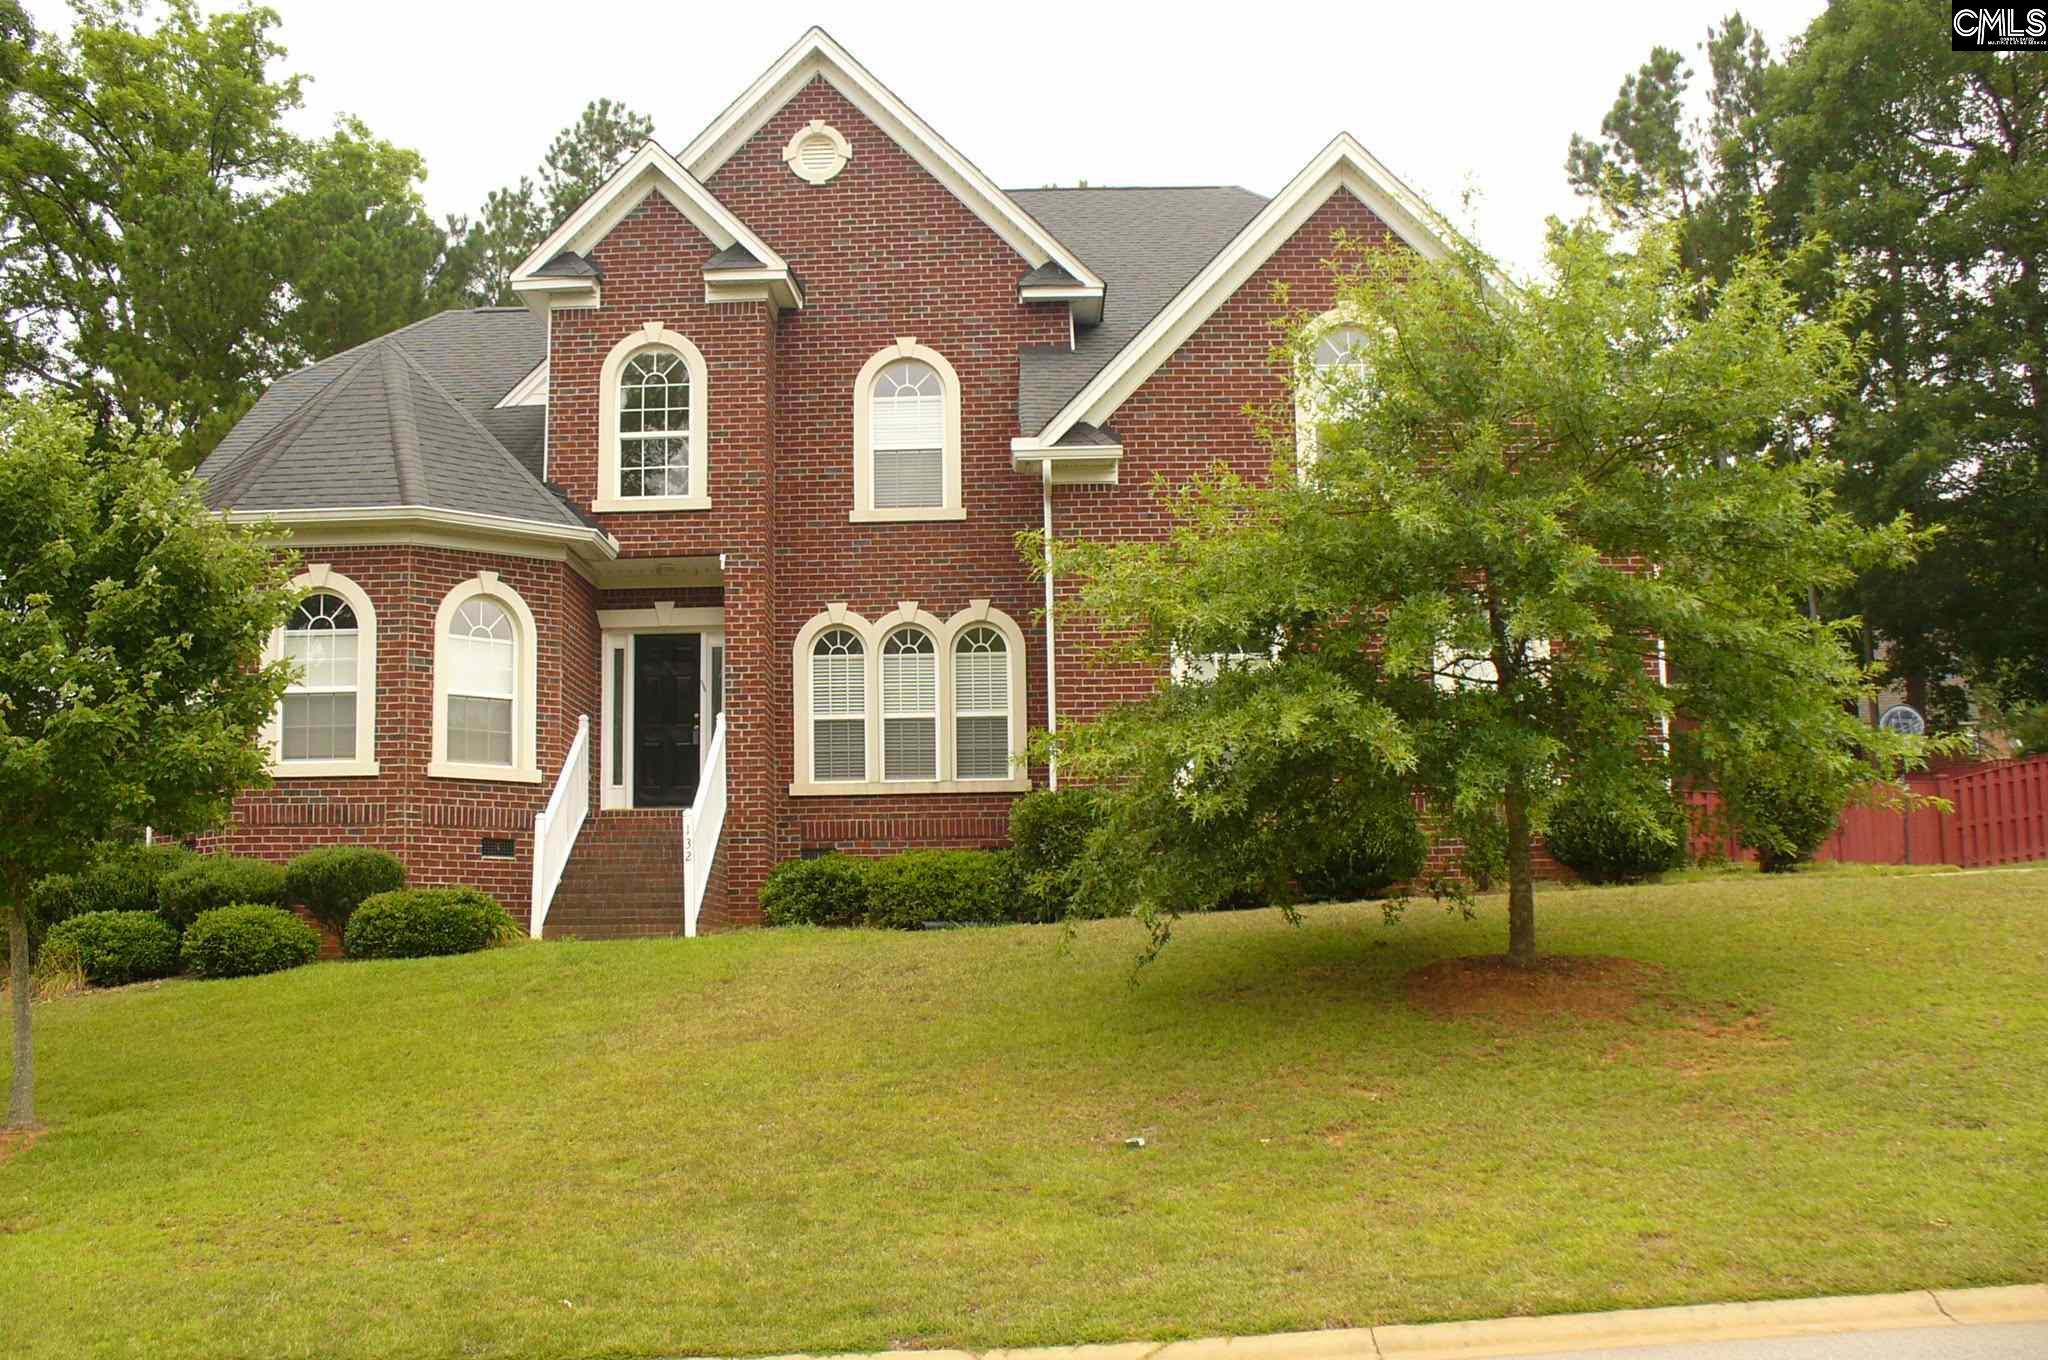 132 Scarlet Oak #126 Lexington, SC 29072